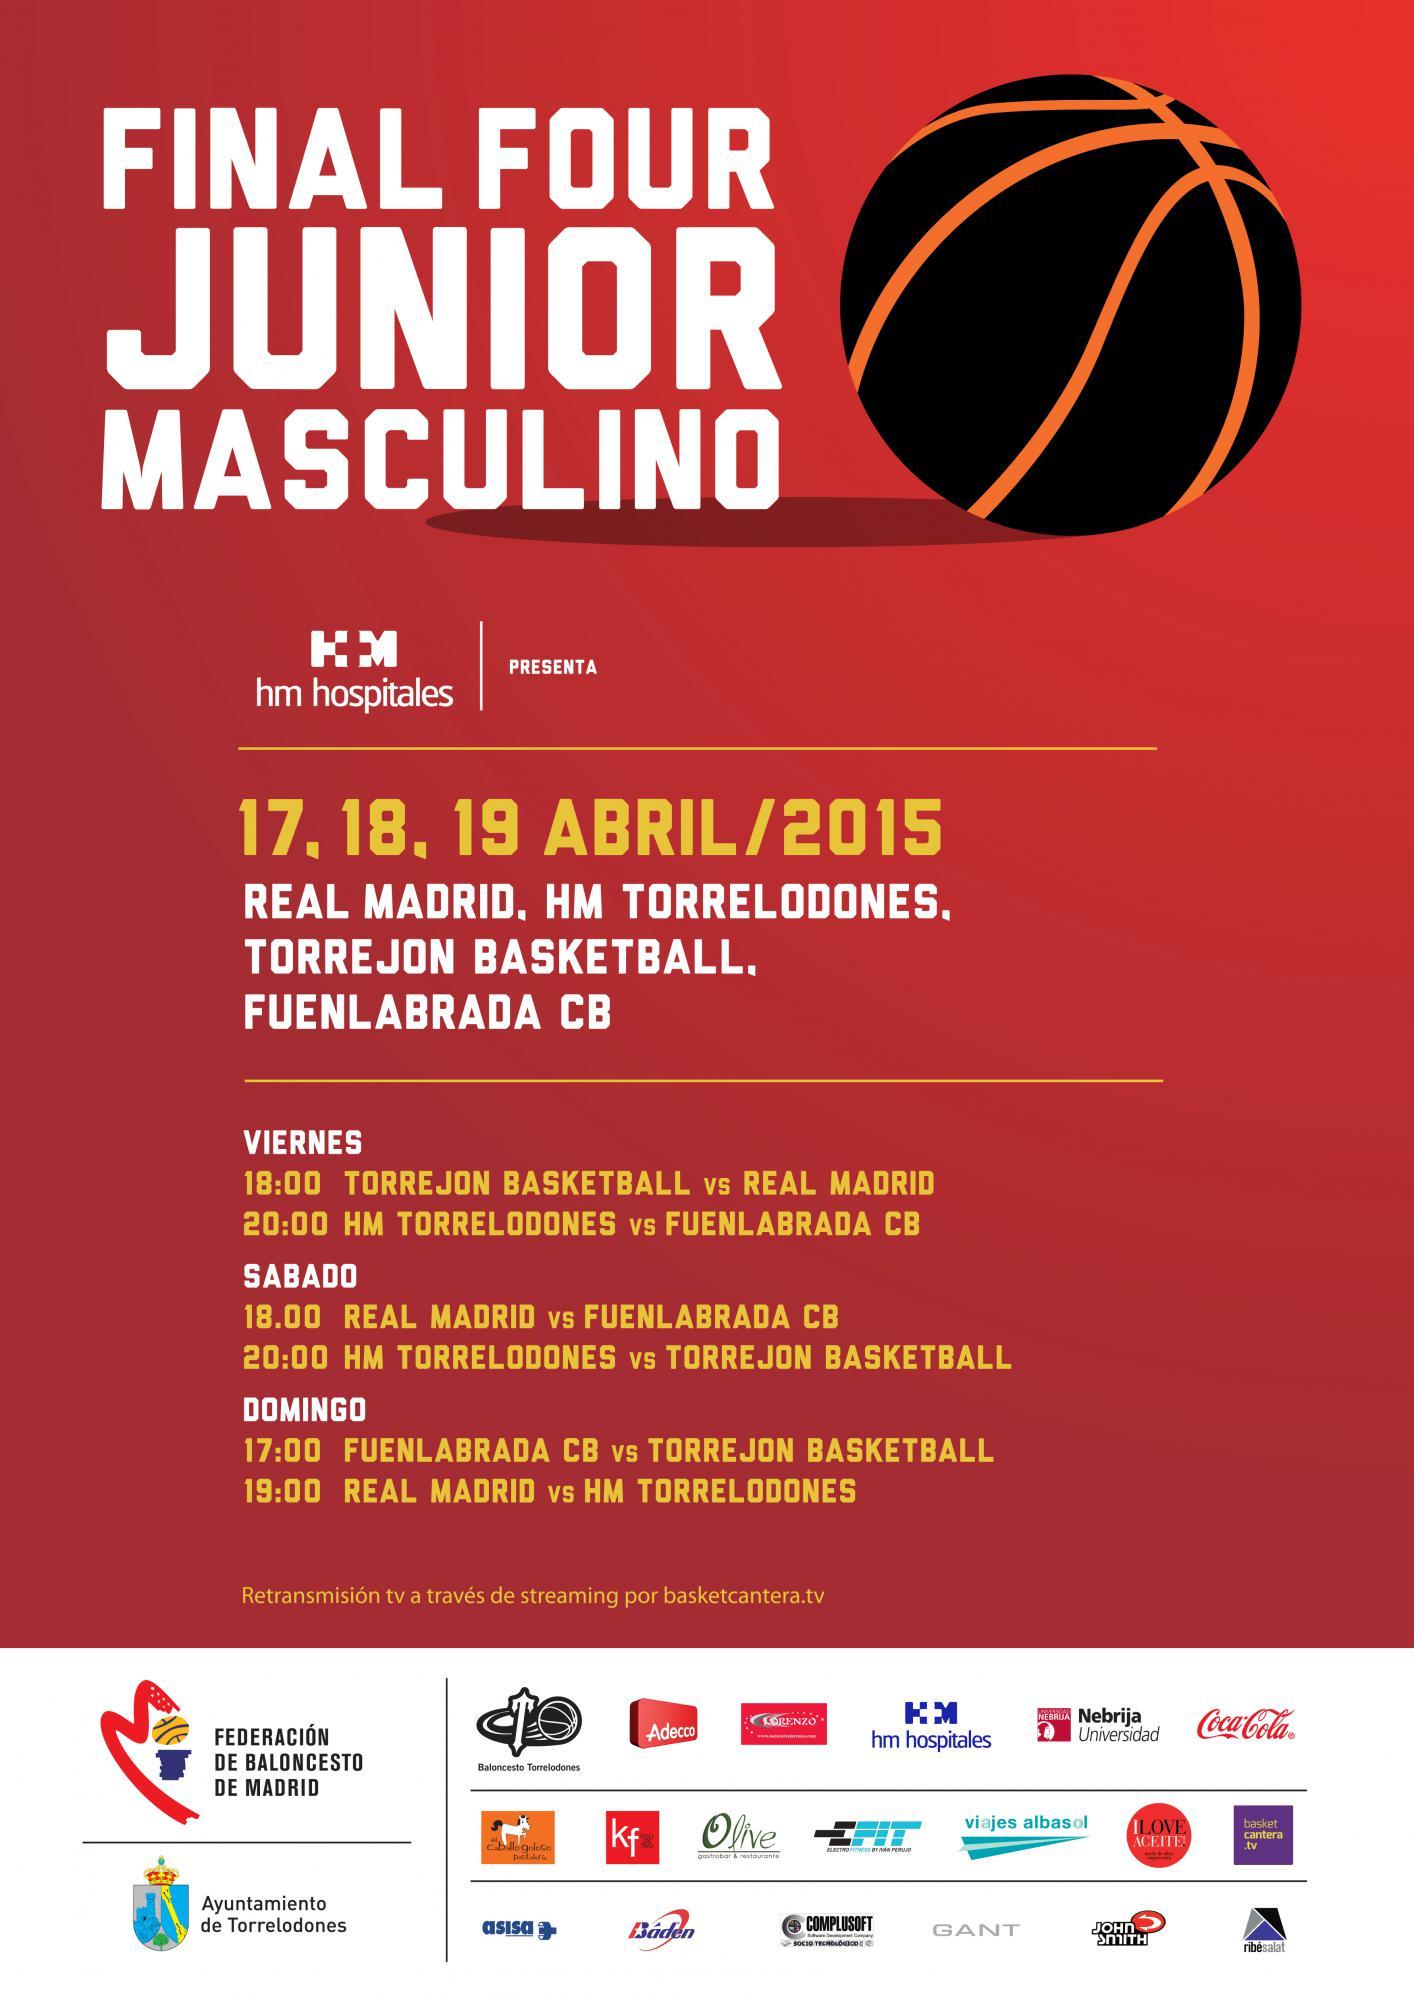 Final four masculino junior, este fin de semana en Torrelodones